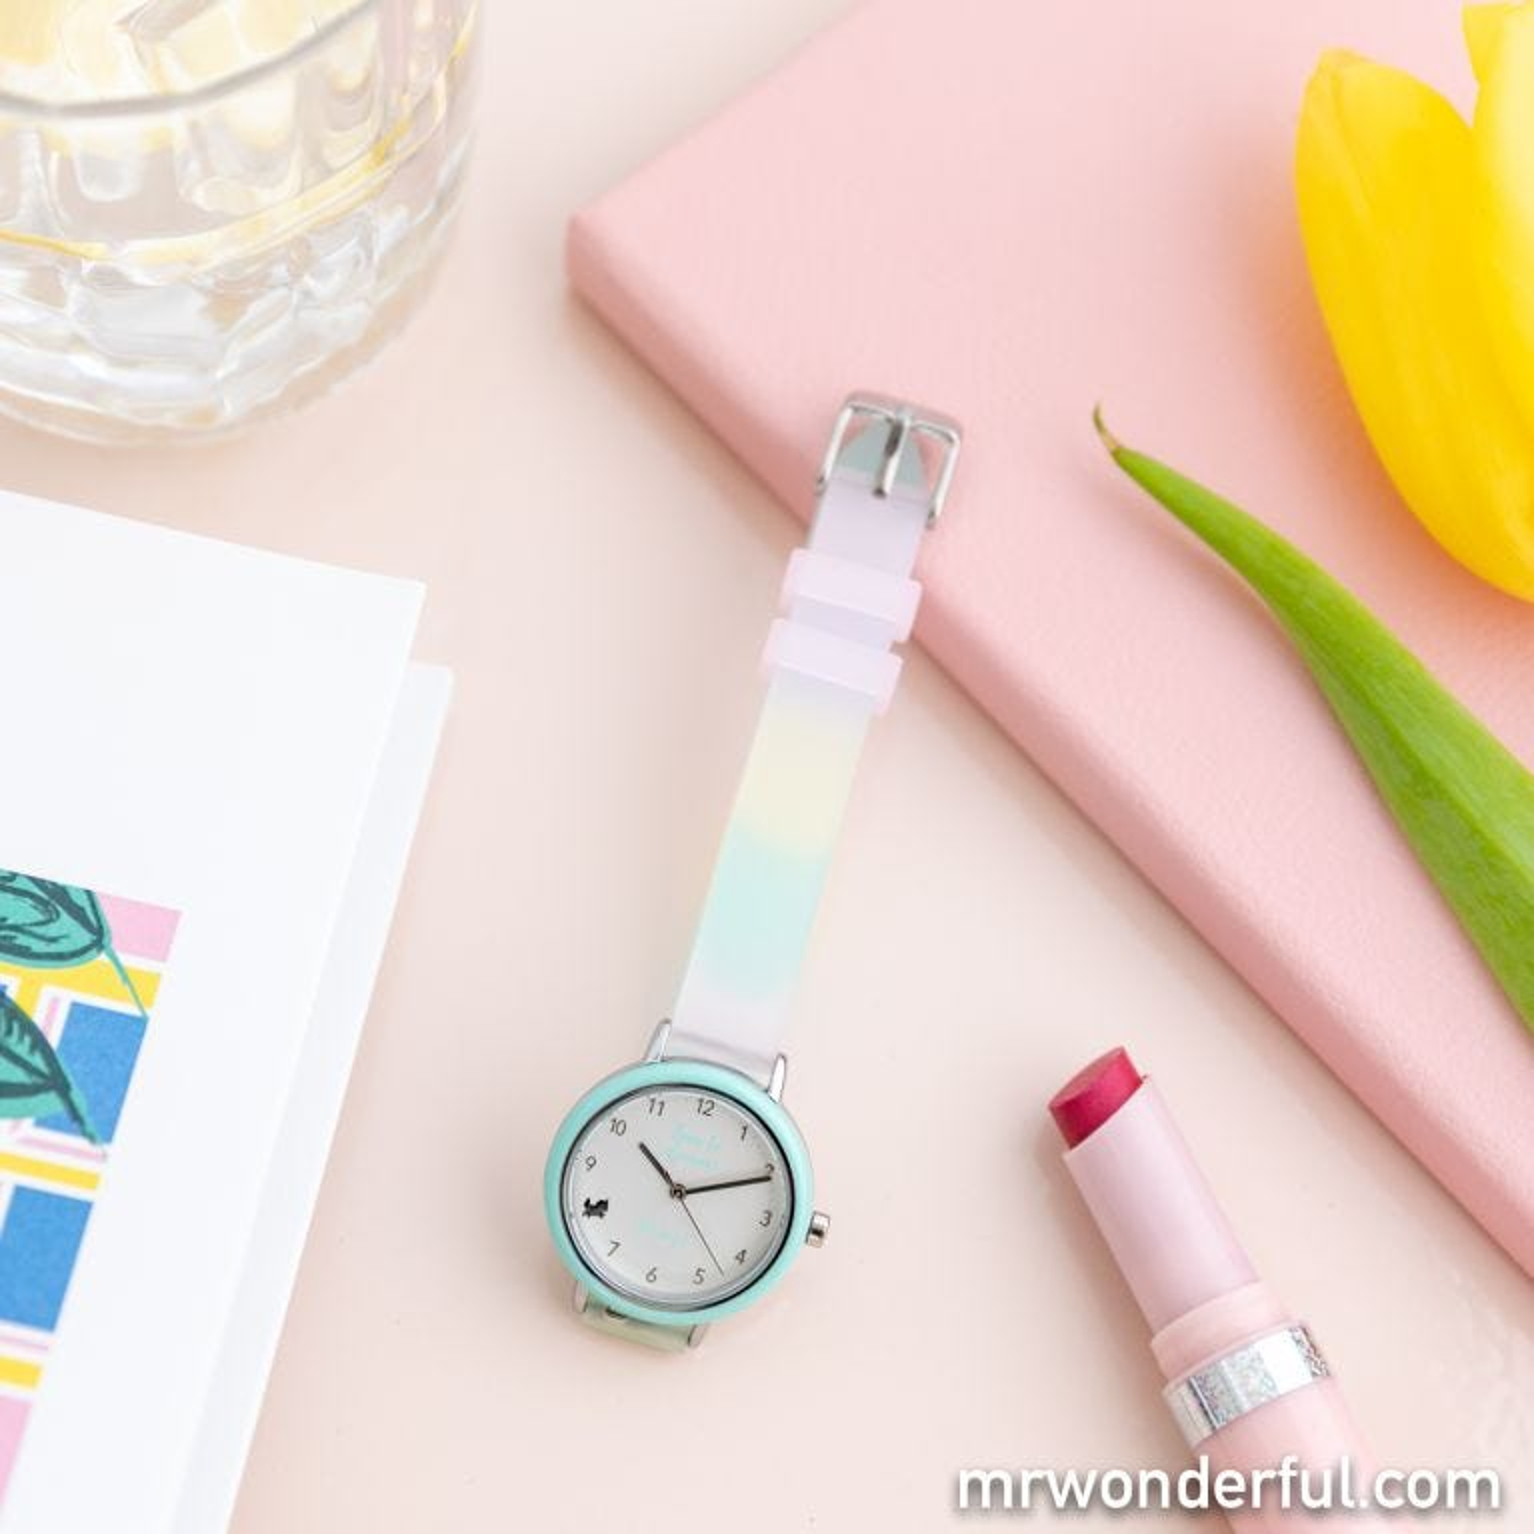 Reloj Rainbow - Have a wonderful time